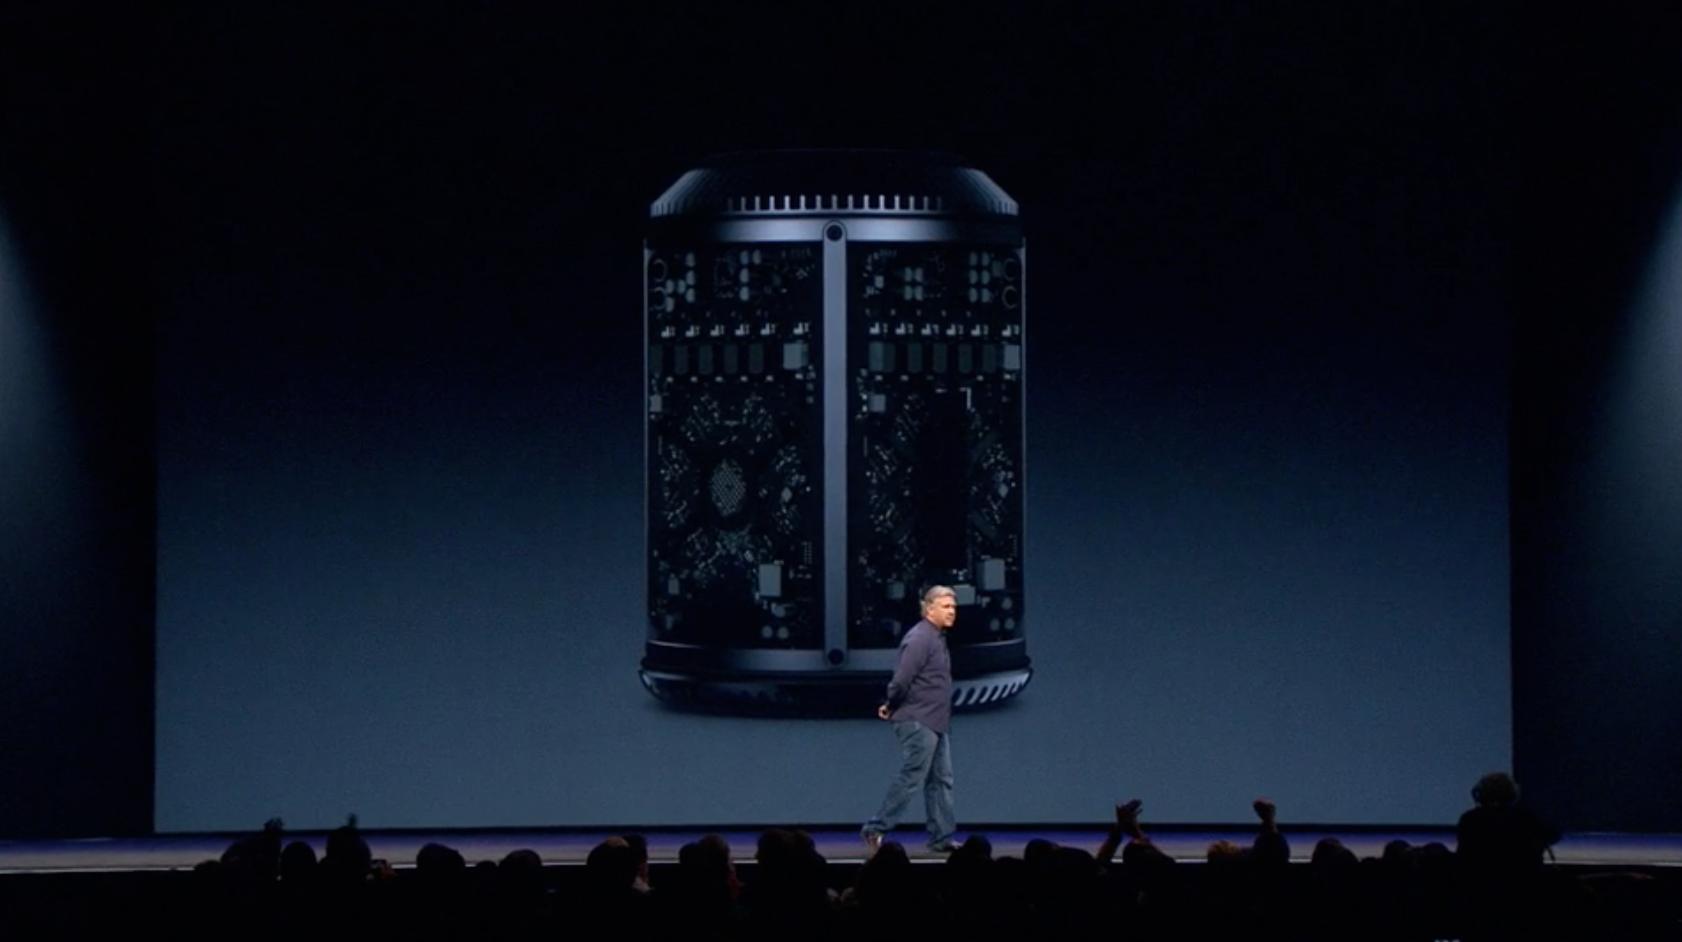 Mac-Pro-WWDC-01